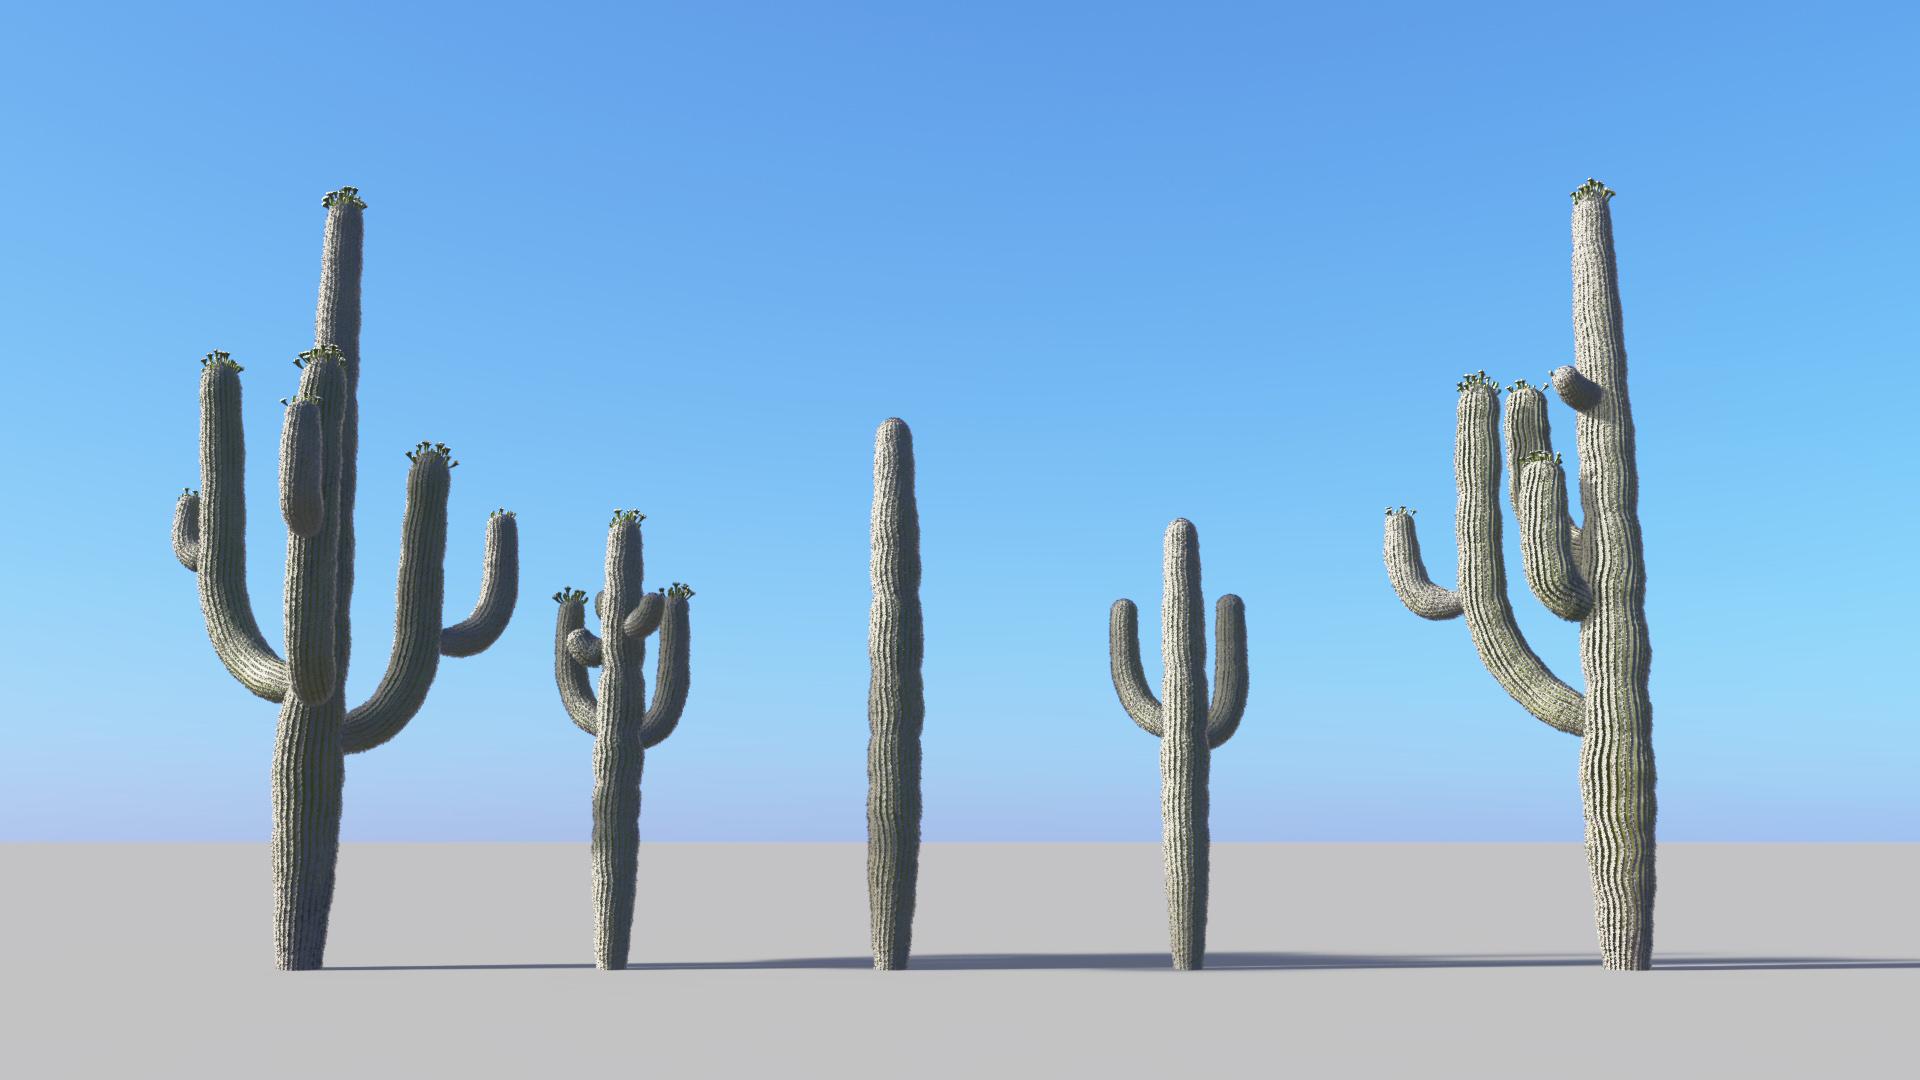 3D model of the Saguaro cactus Carnegiea gigantea